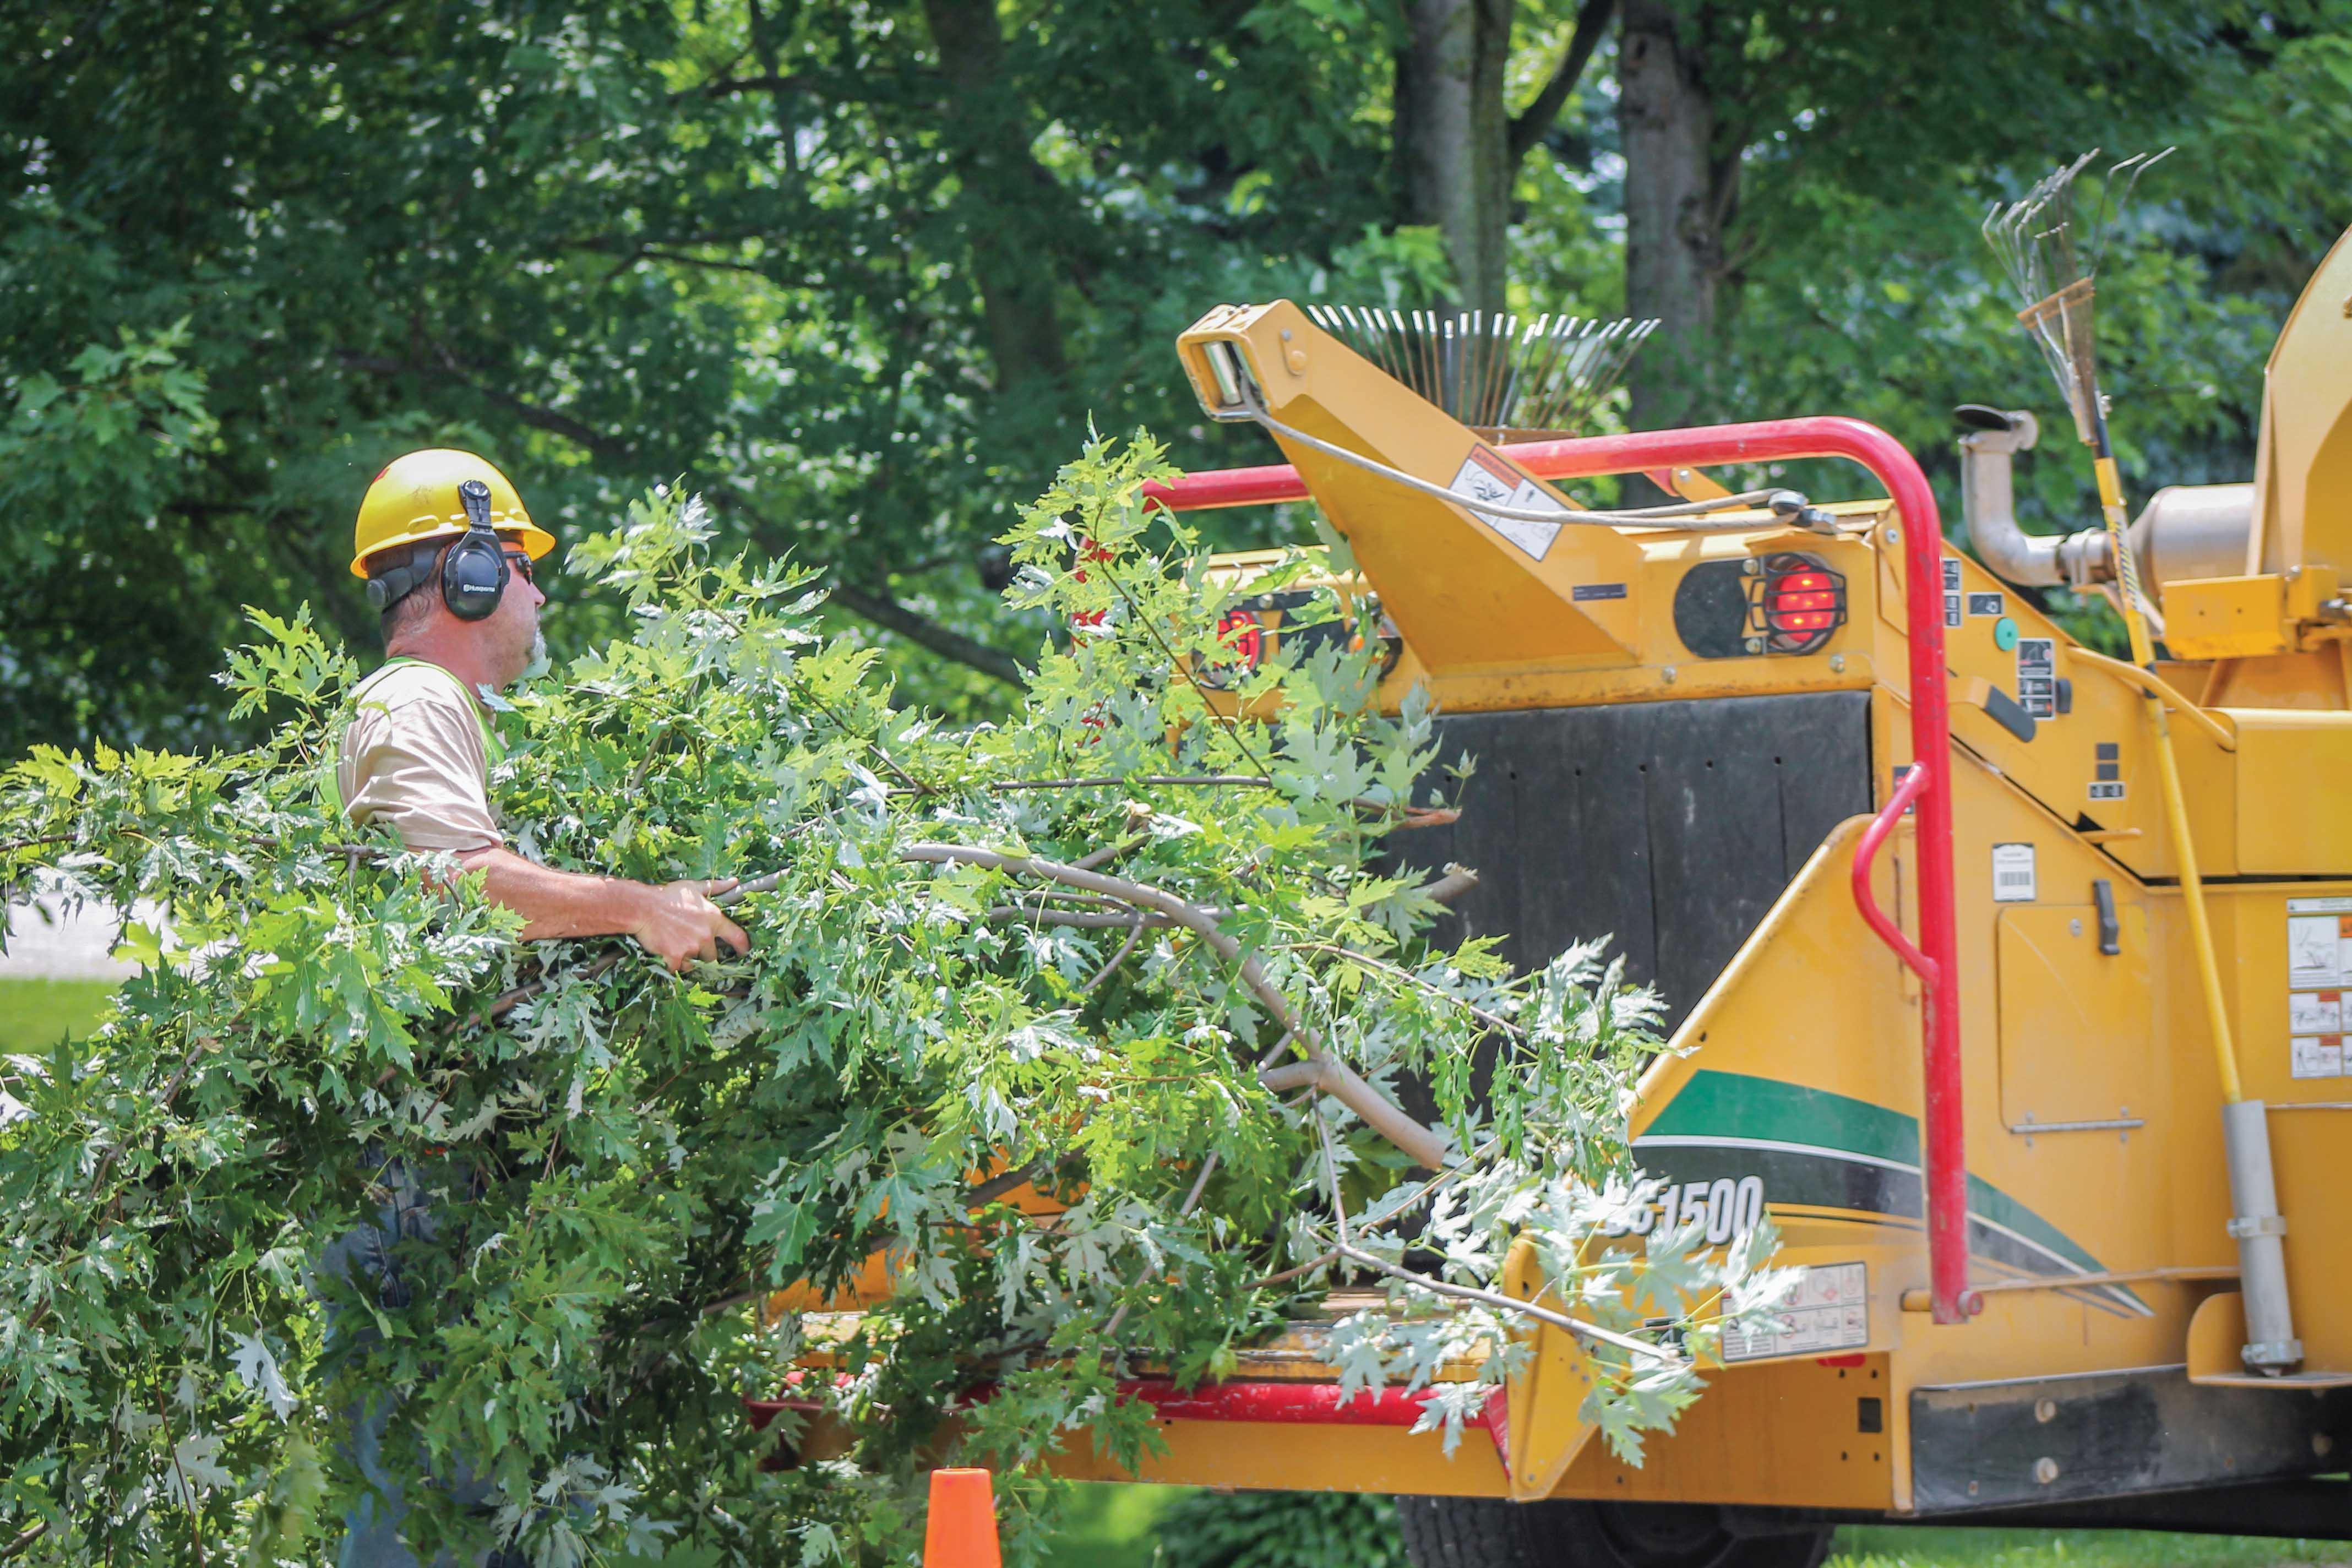 Tree trimming crew